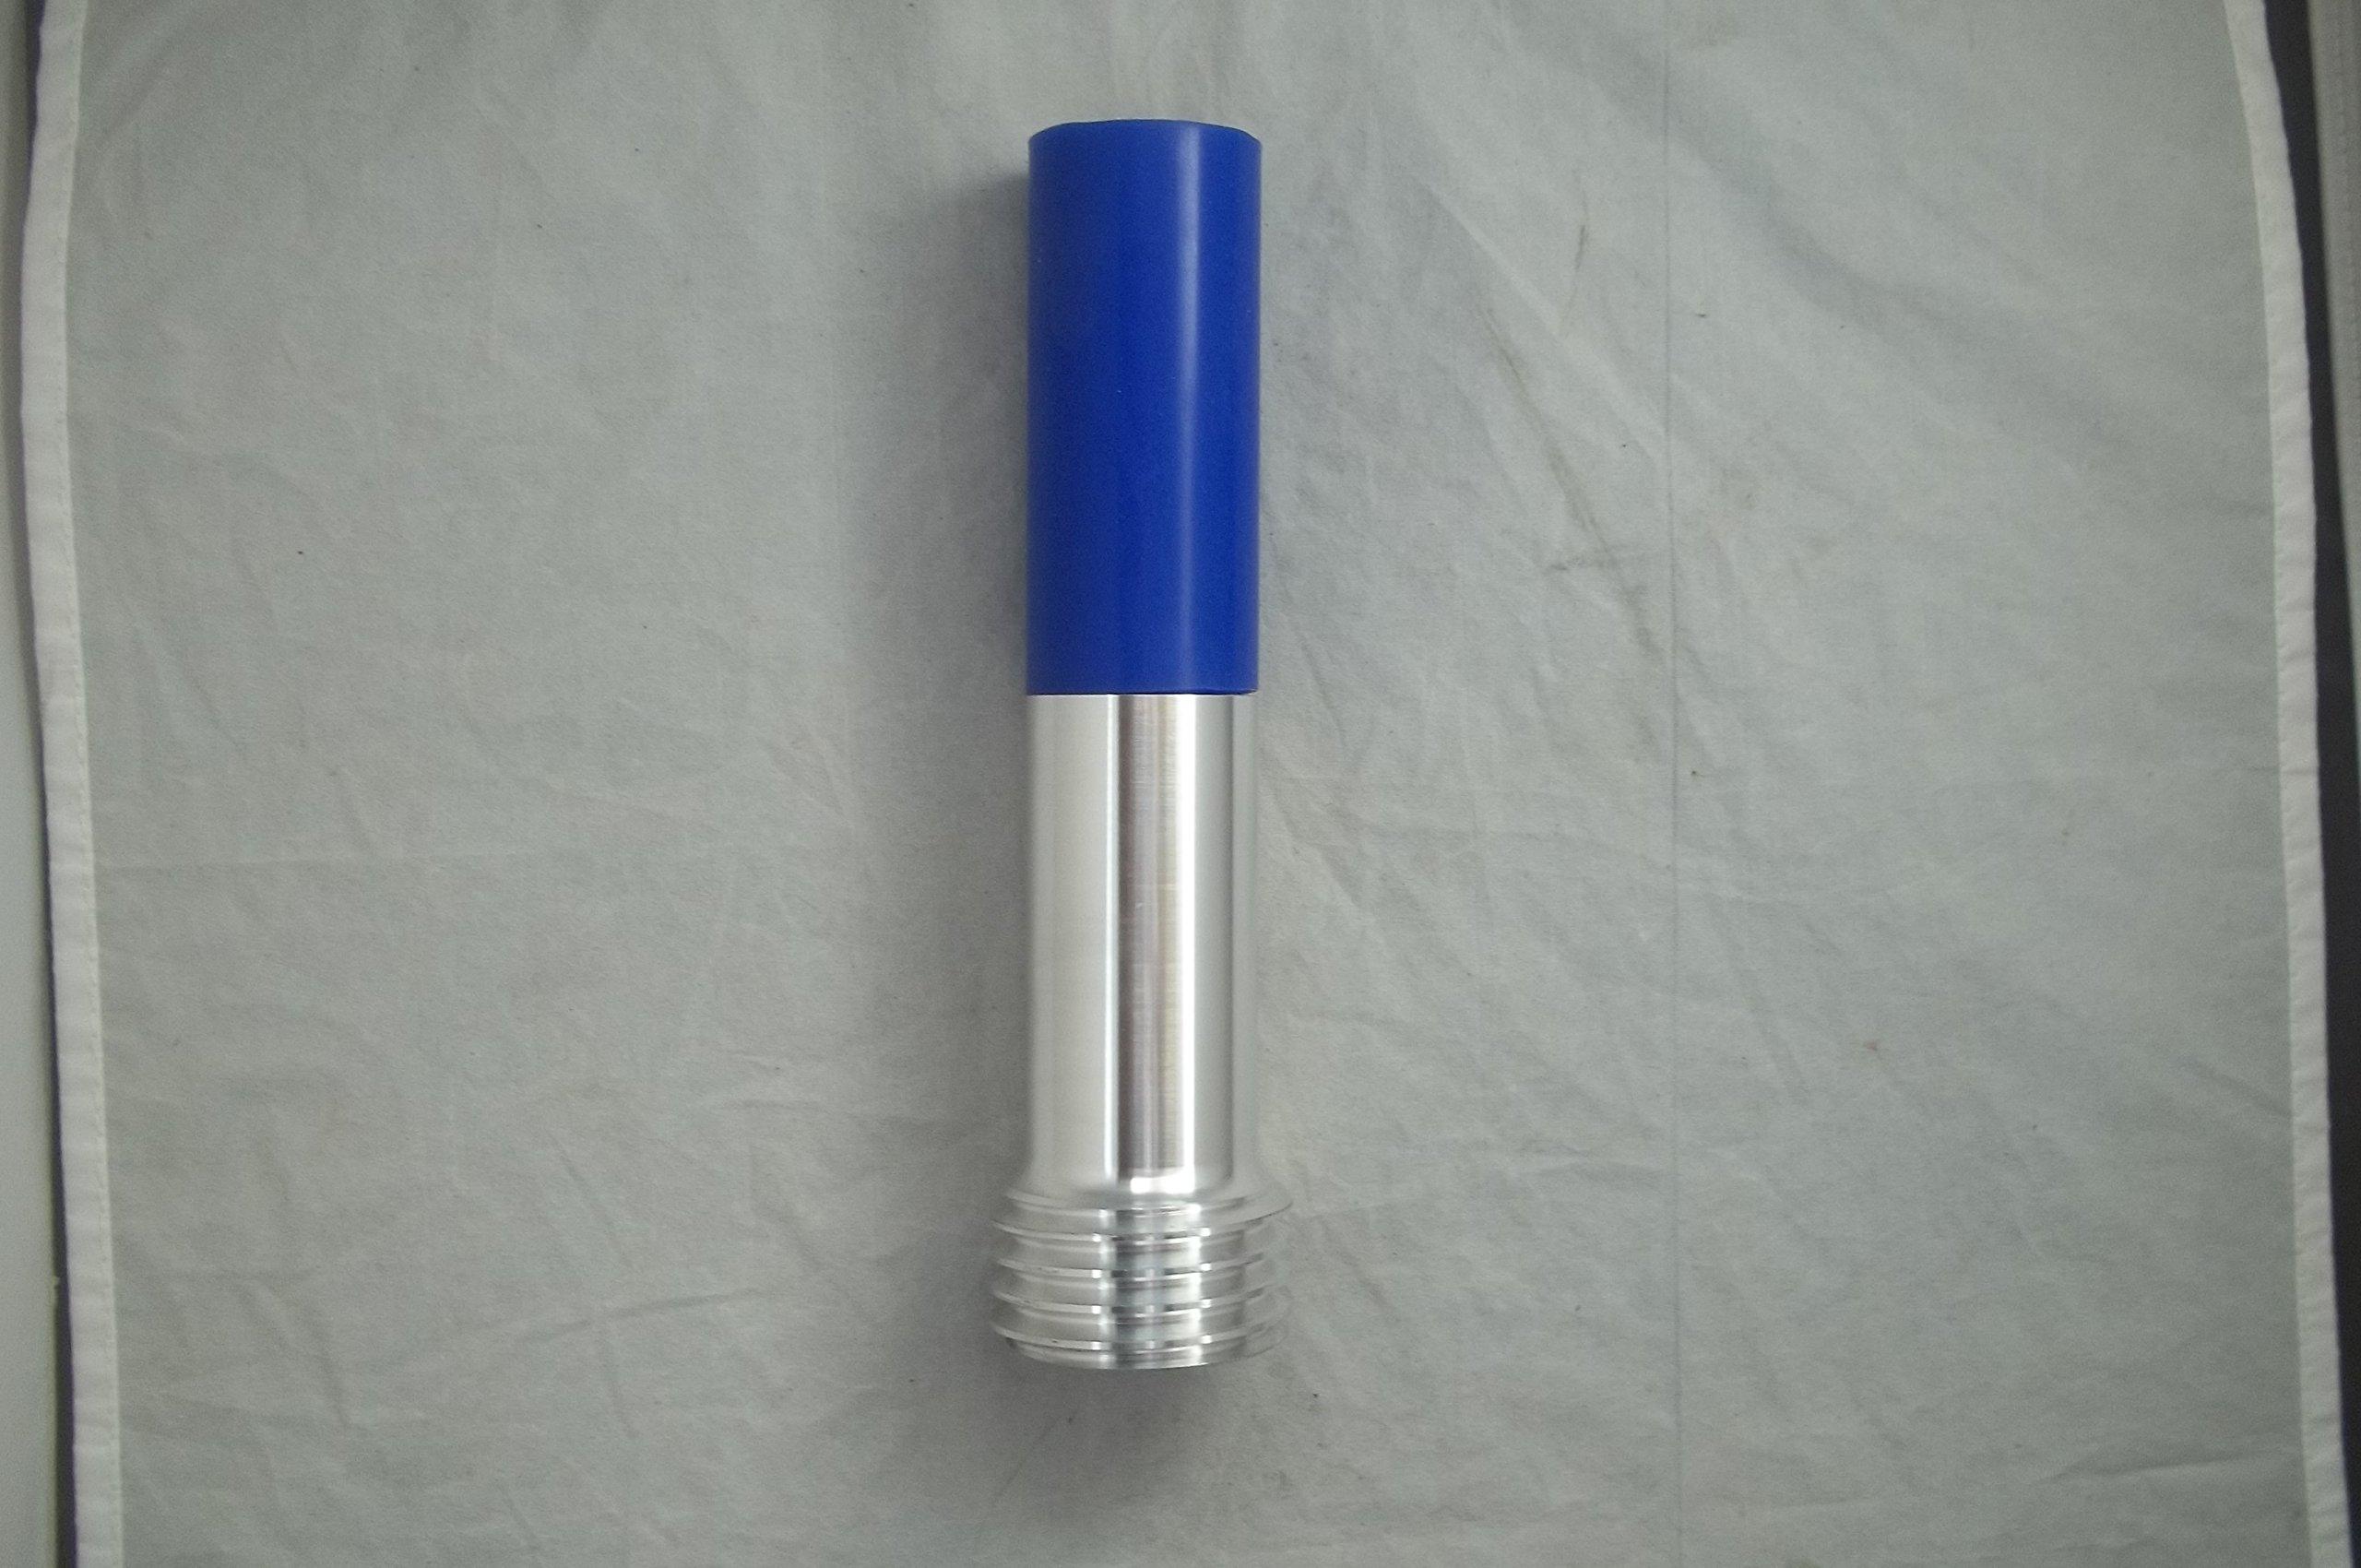 Blast Nozzle Tungsten Carbide with Aluminum Jacket Sandblast Size # 7